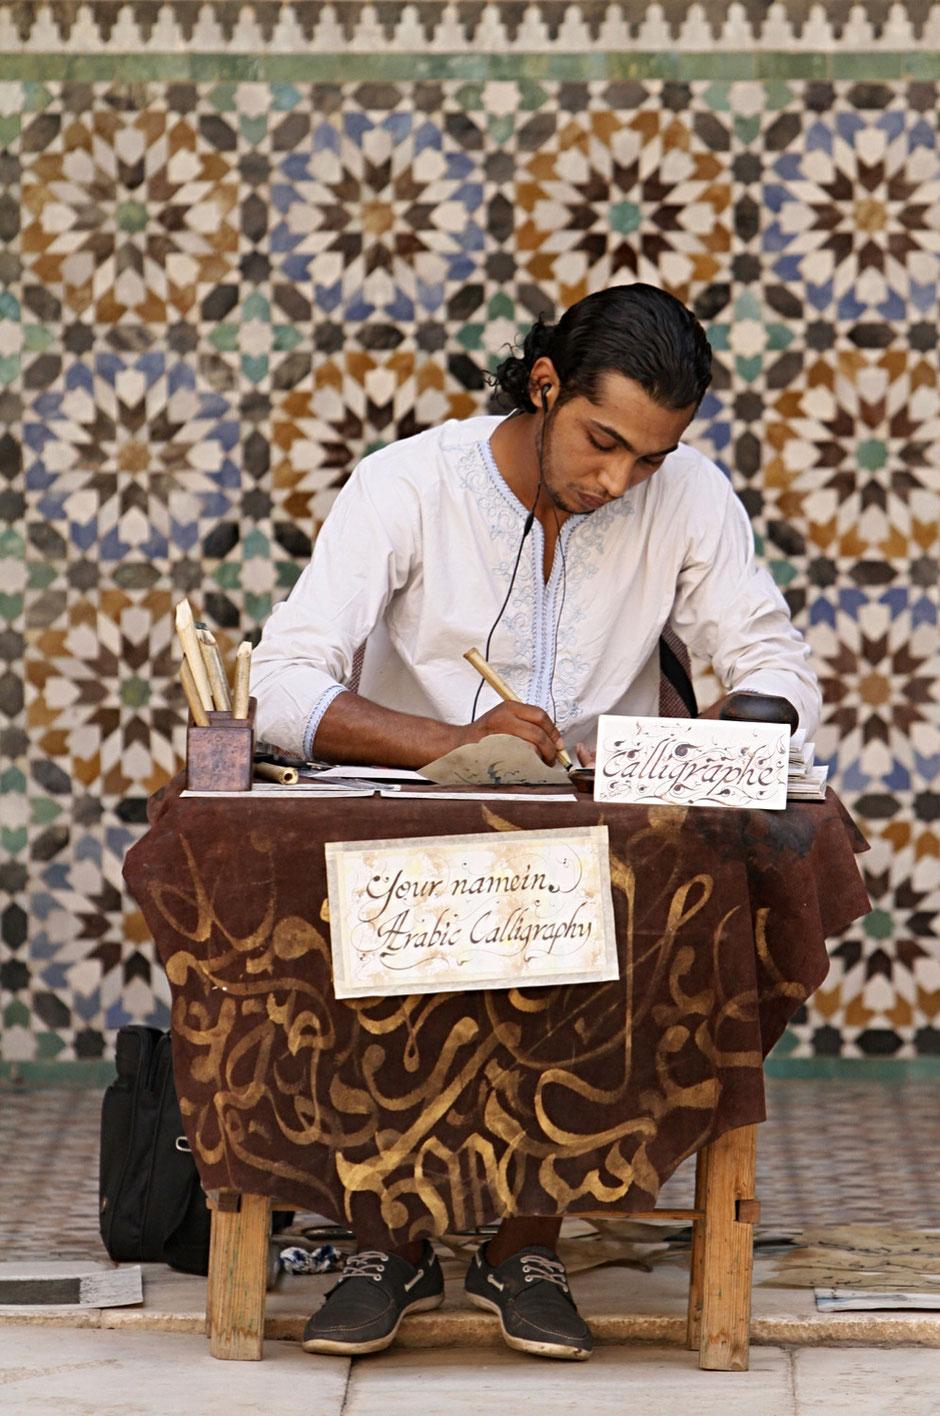 Calligraphe. Medersa Ben Youssef. Ecole coranique.